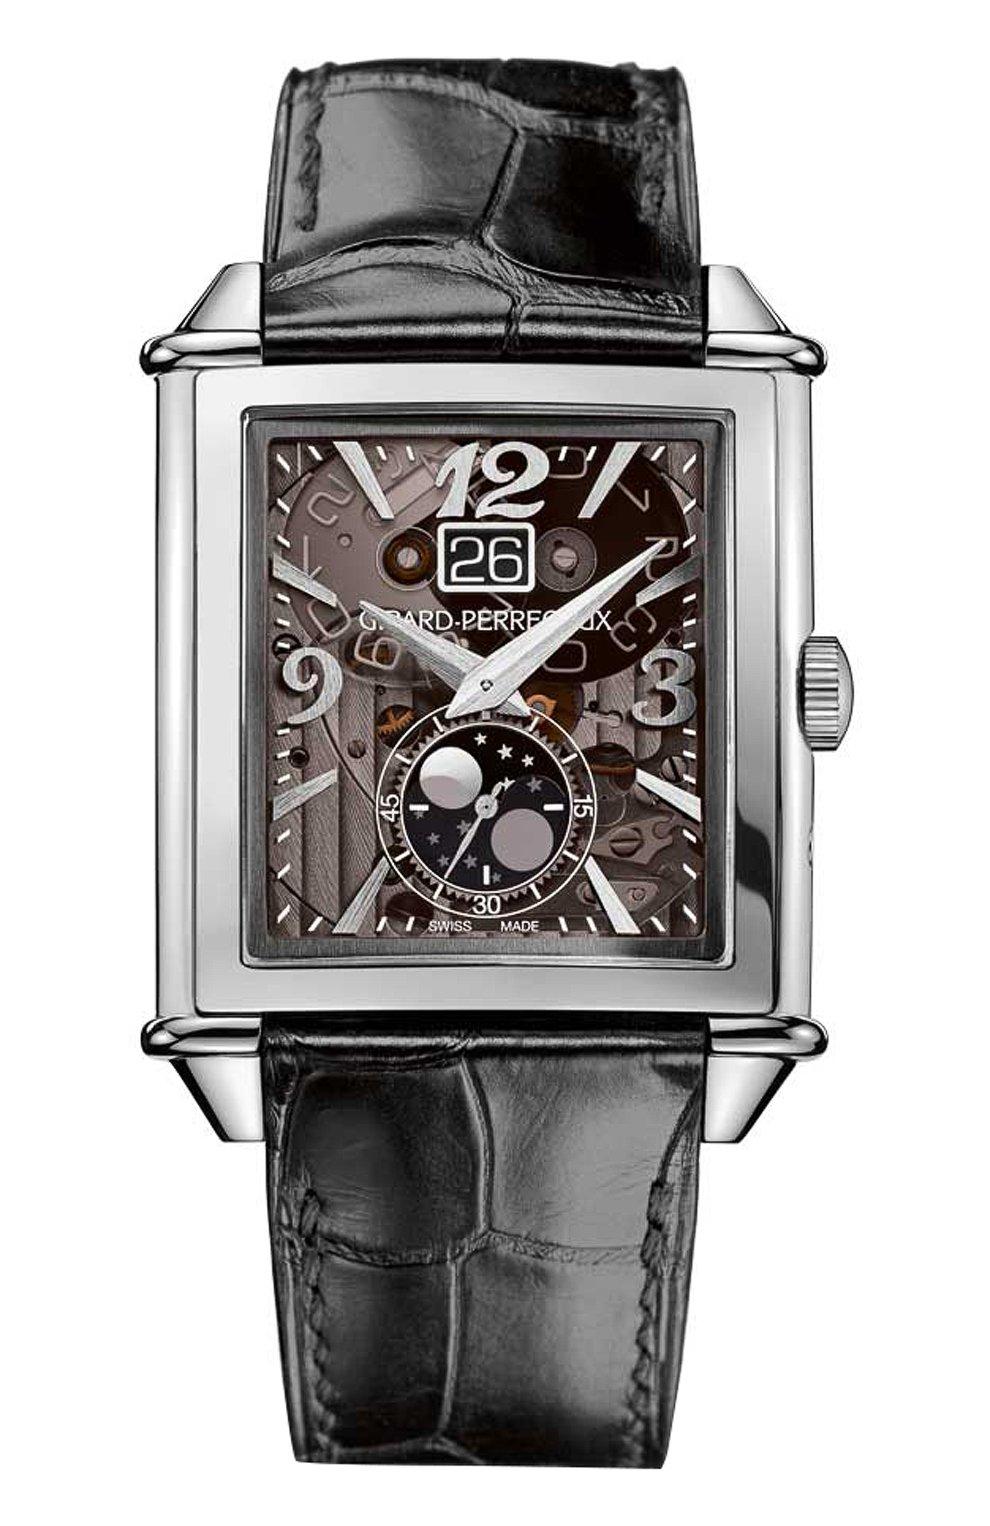 Мужские часы xxl large date steel grey GIRARD-PERREGAUX серого цвета, арт. 25882-11-223-BB6B   Фото 1